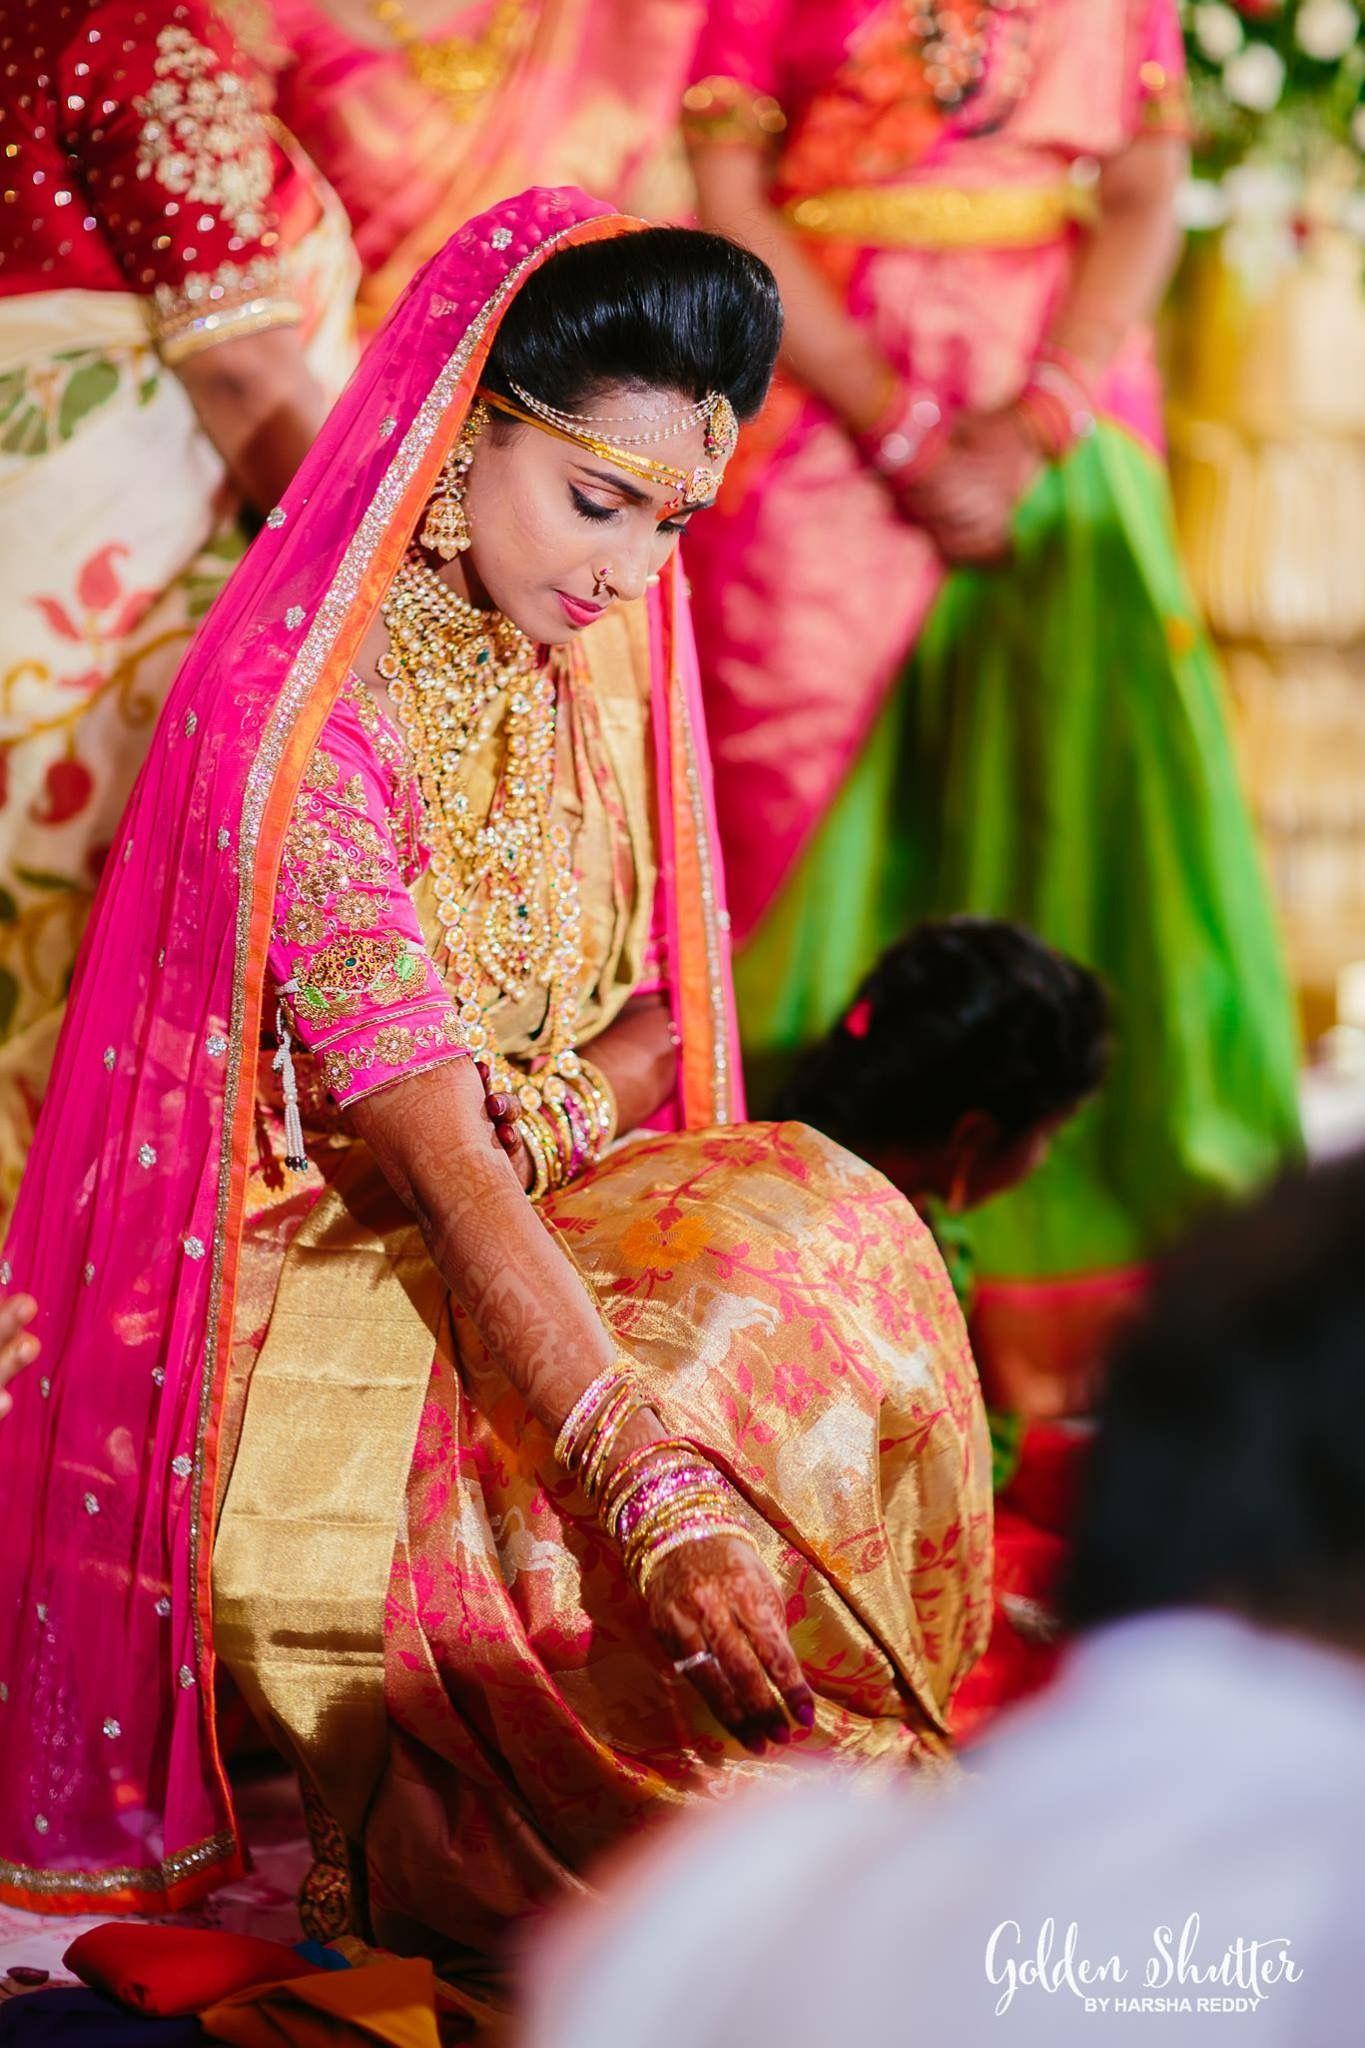 Engagement pattu saree images pin by spandana reddy sappidi on southindian bride  pinterest